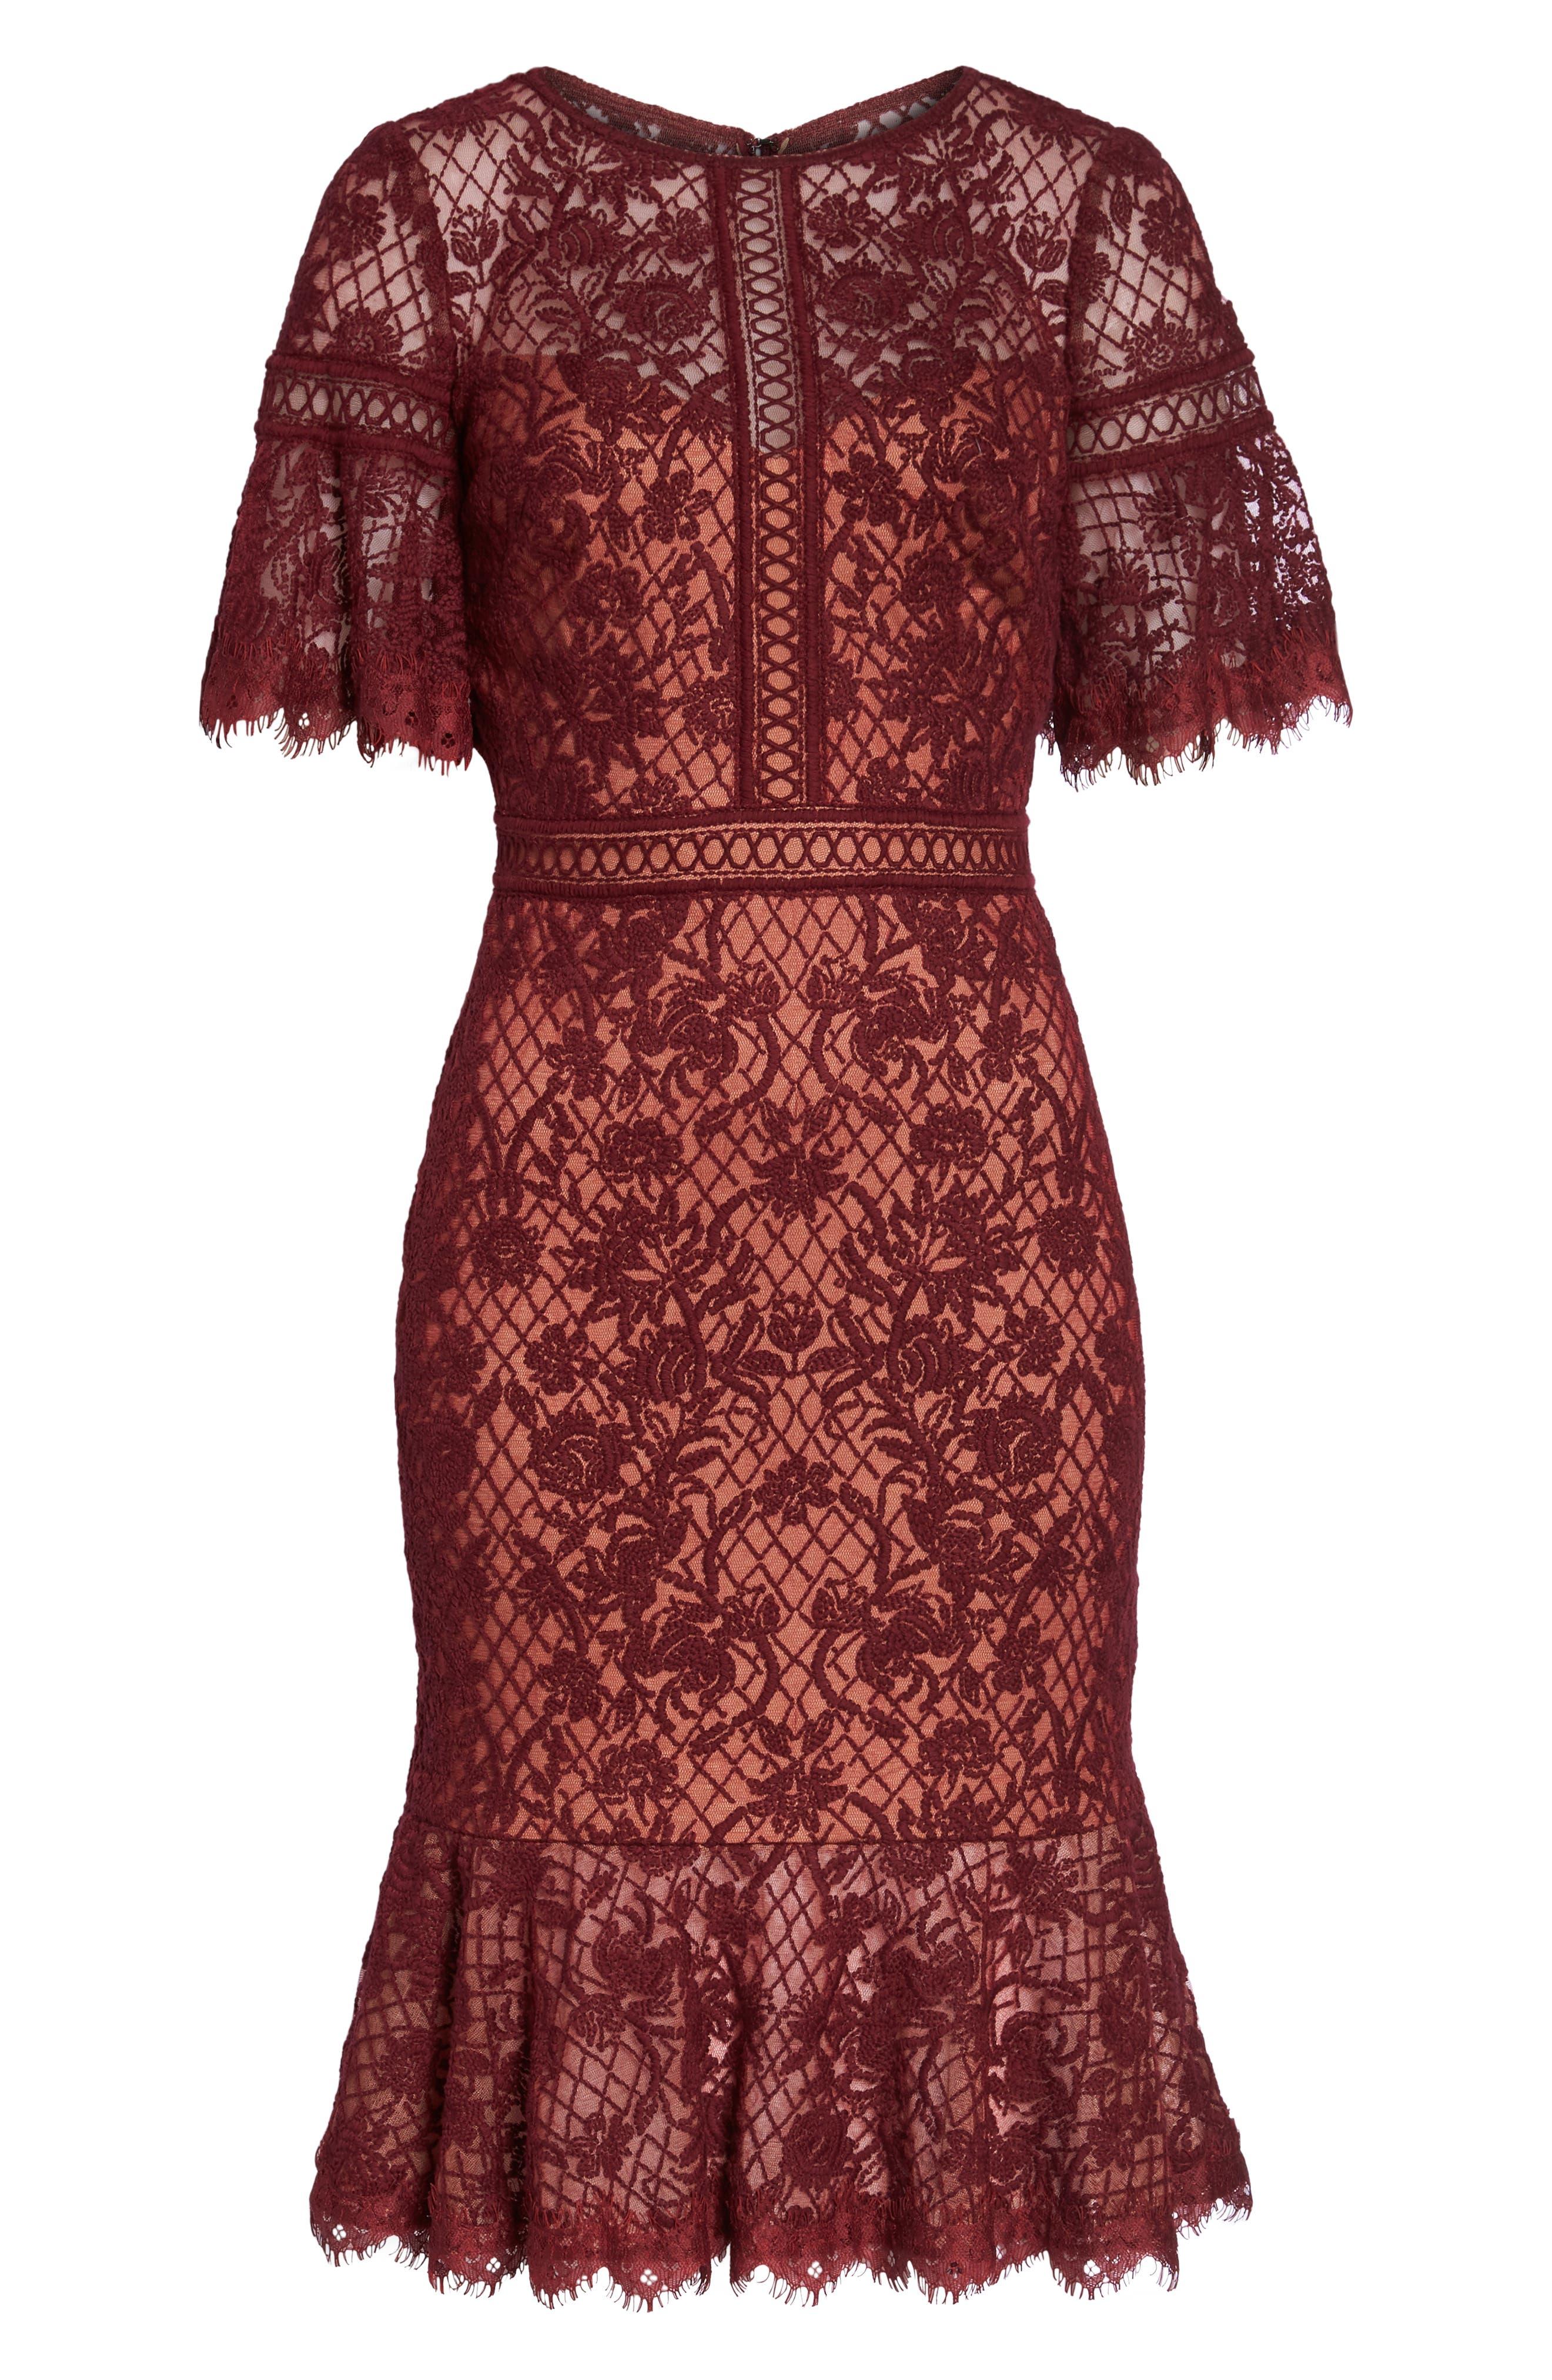 TADASHI SHOJI, Embroidered Mesh Dress, Alternate thumbnail 7, color, 603